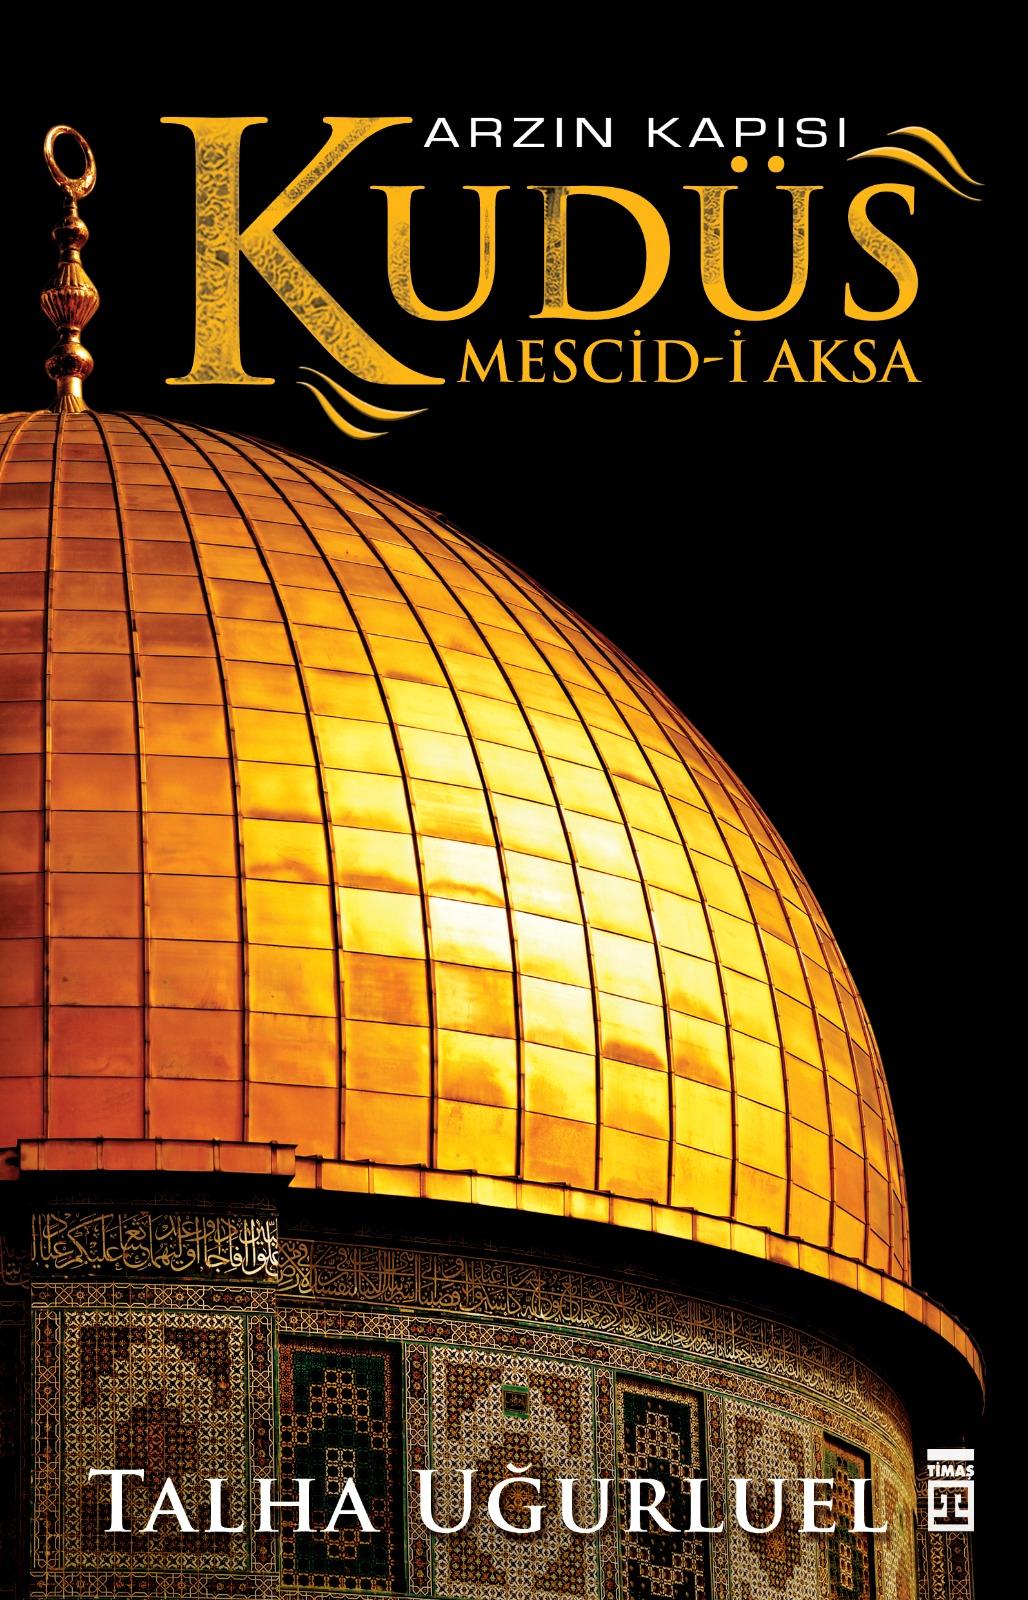 Arzın Kapısı Kudüs